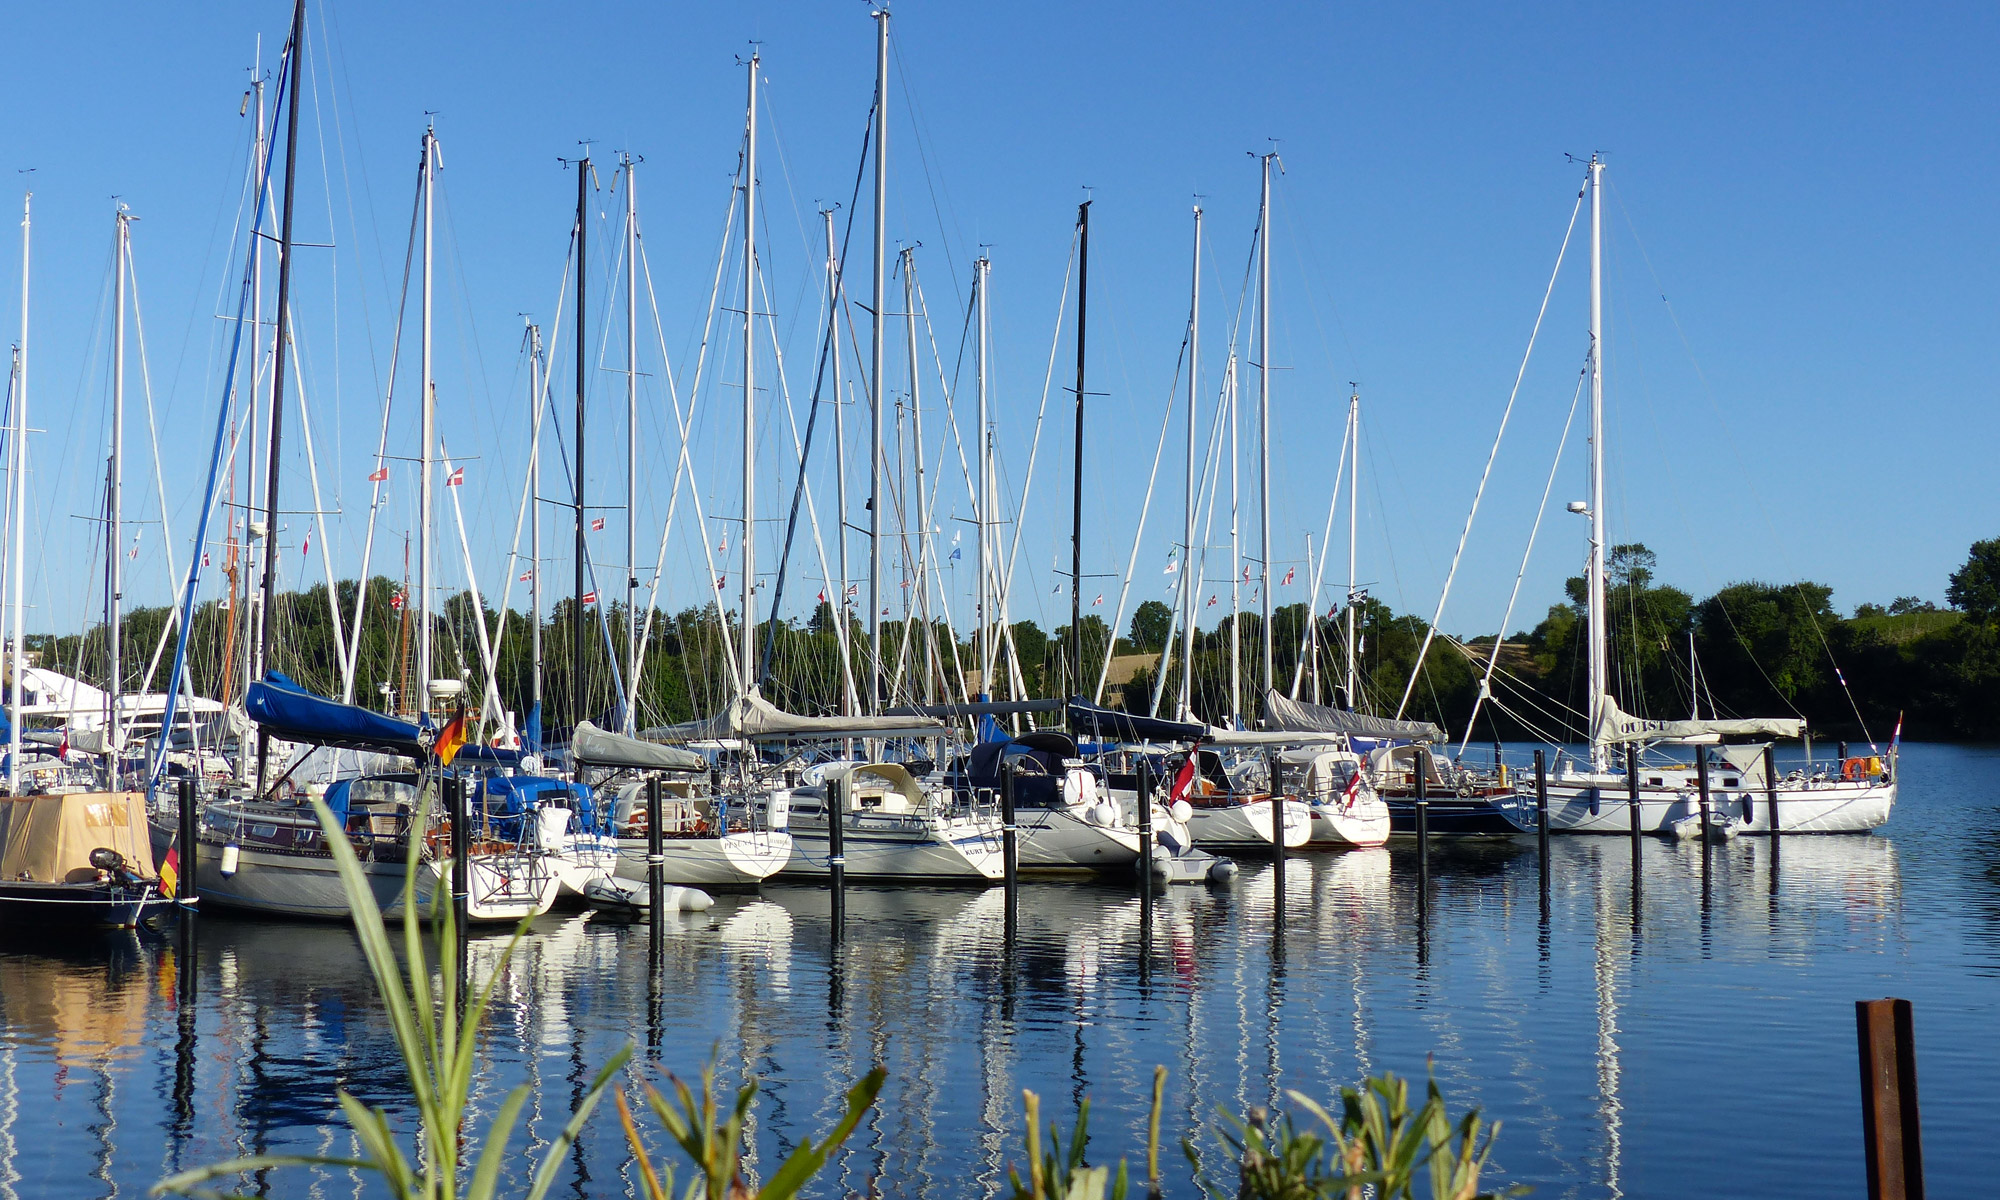 Yachtcharter Dänemark